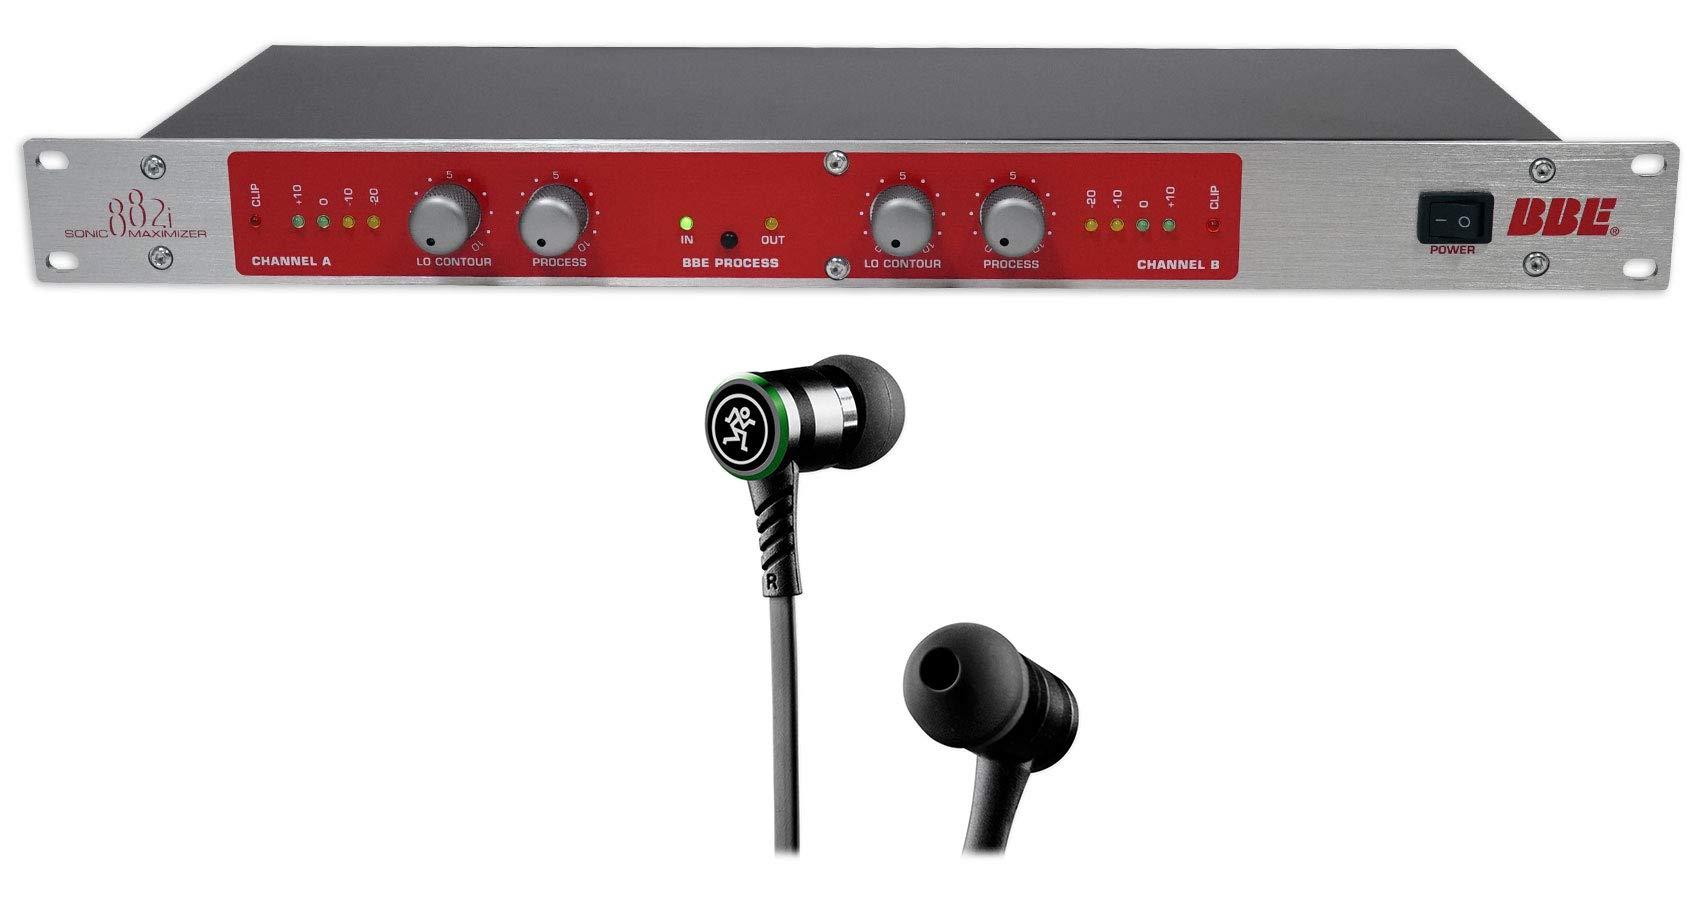 BBE 882I Rack Mount Studio Sonic Maximizer Signal Sound Processor+Mackie Earbuds